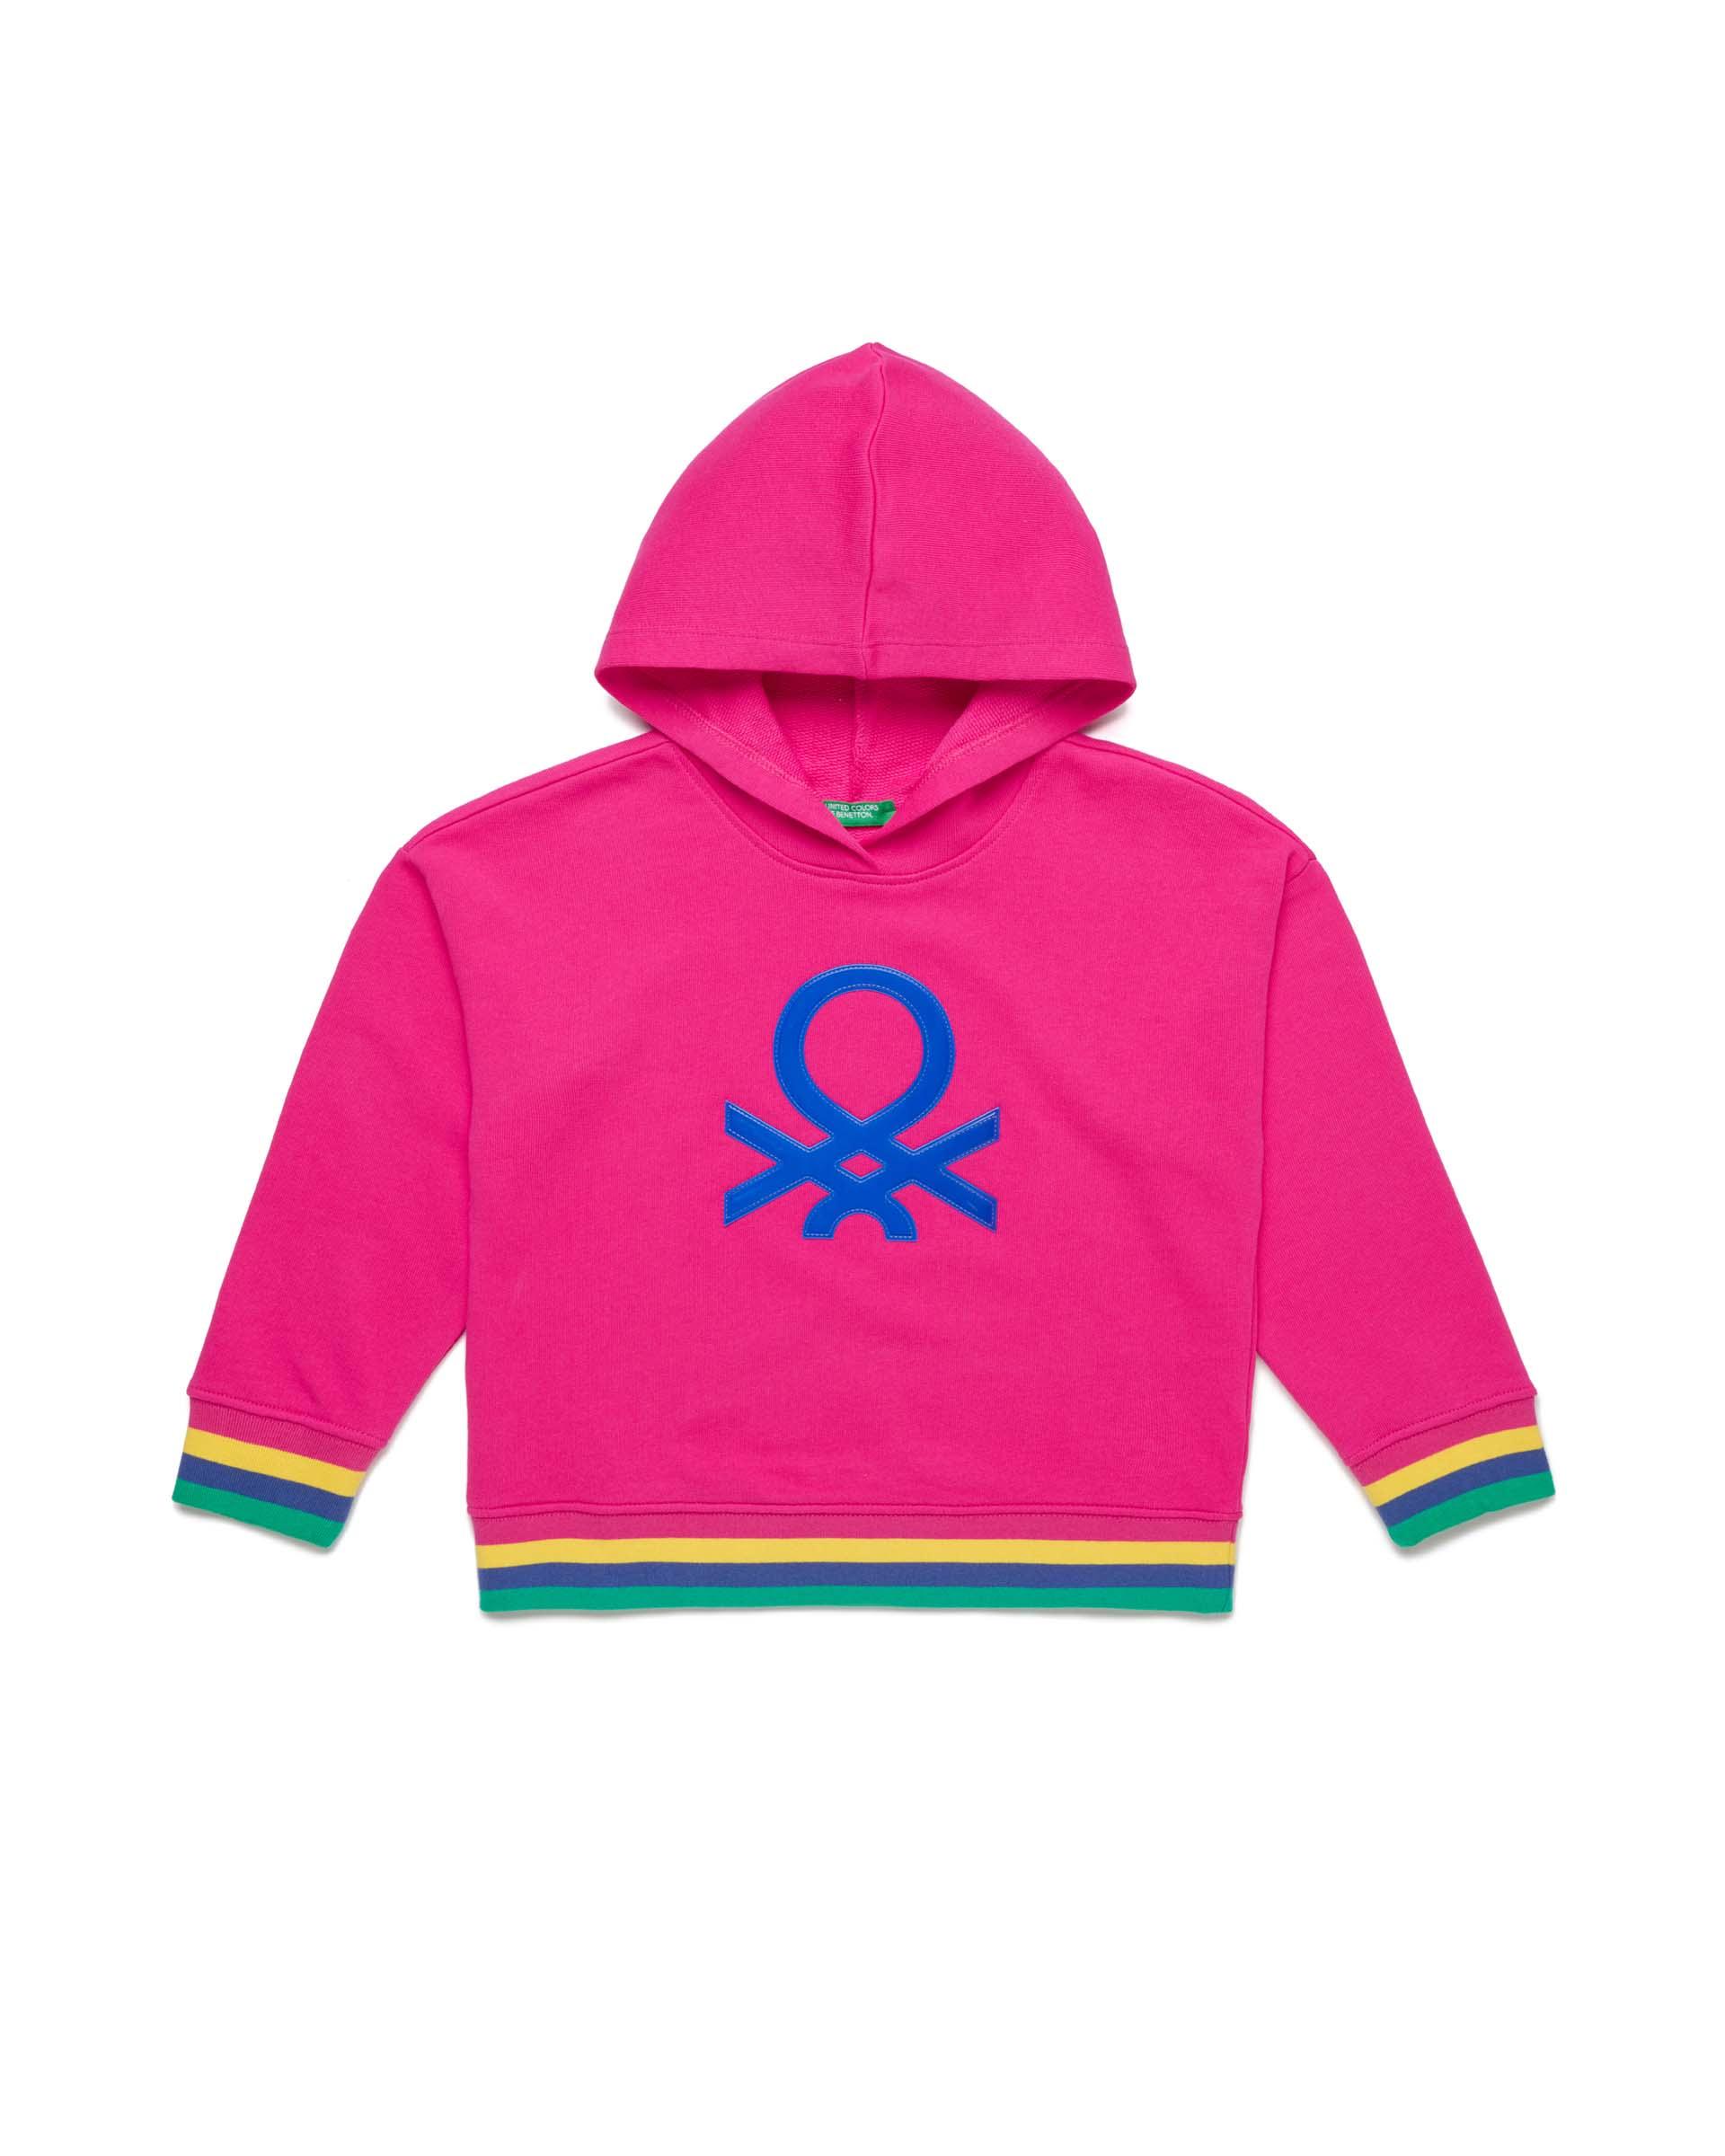 Купить 20P_3J68C2175_2L3, Толстовка для девочек Benetton 3J68C2175_2L3 р-р 140, United Colors of Benetton, Толстовки для девочек